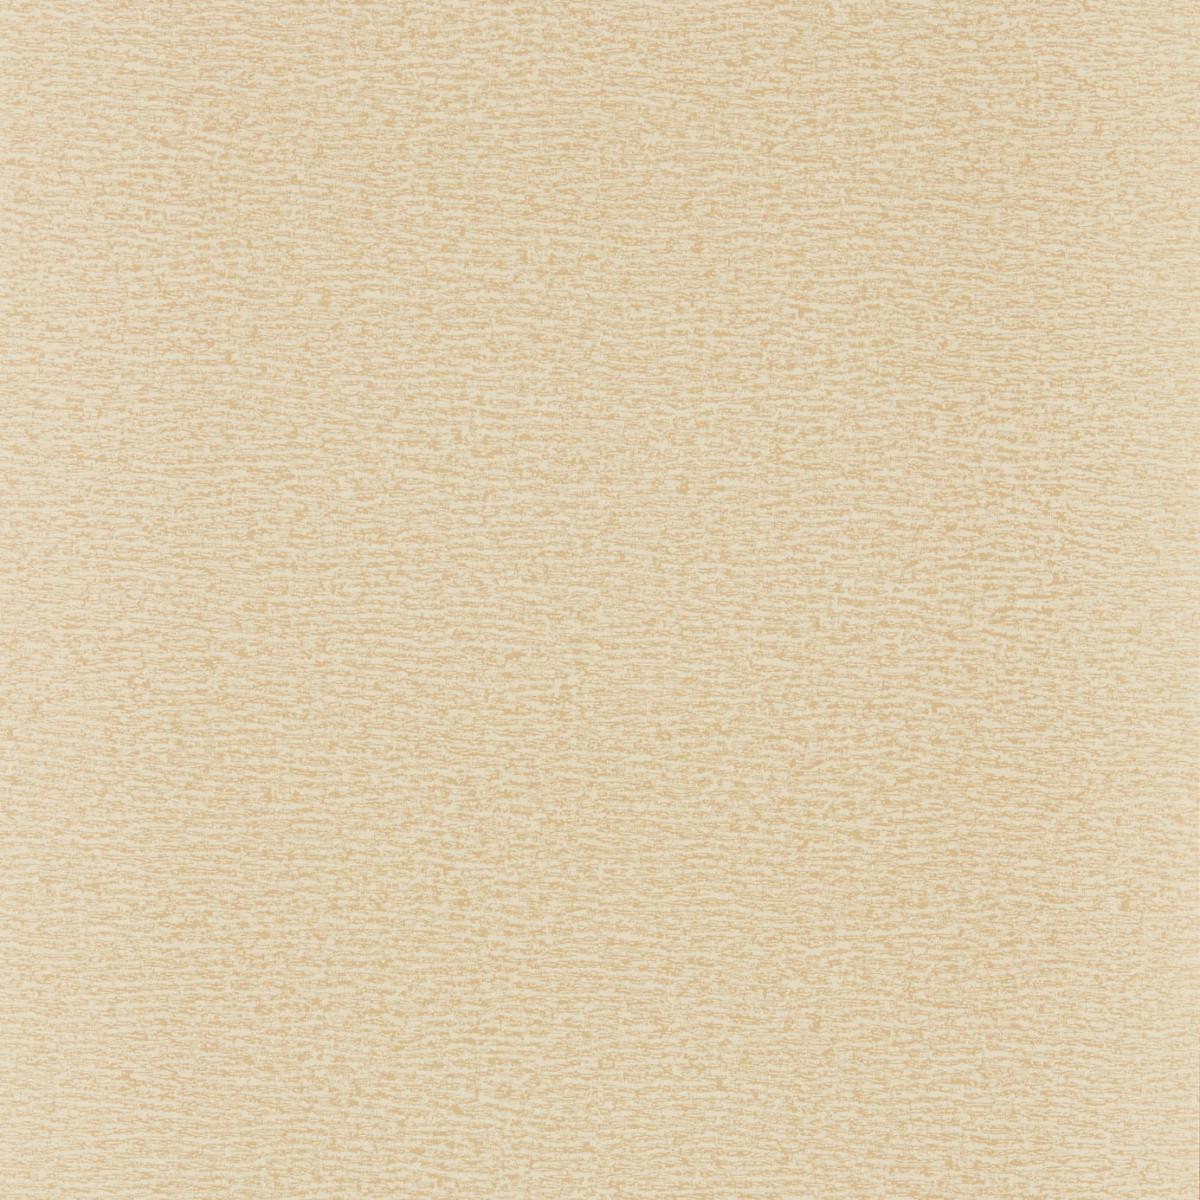 Обои флизелиновые Oxford Street Papers Fine English Wallpapers Vol. I бежевые 0.53 м AREM 05